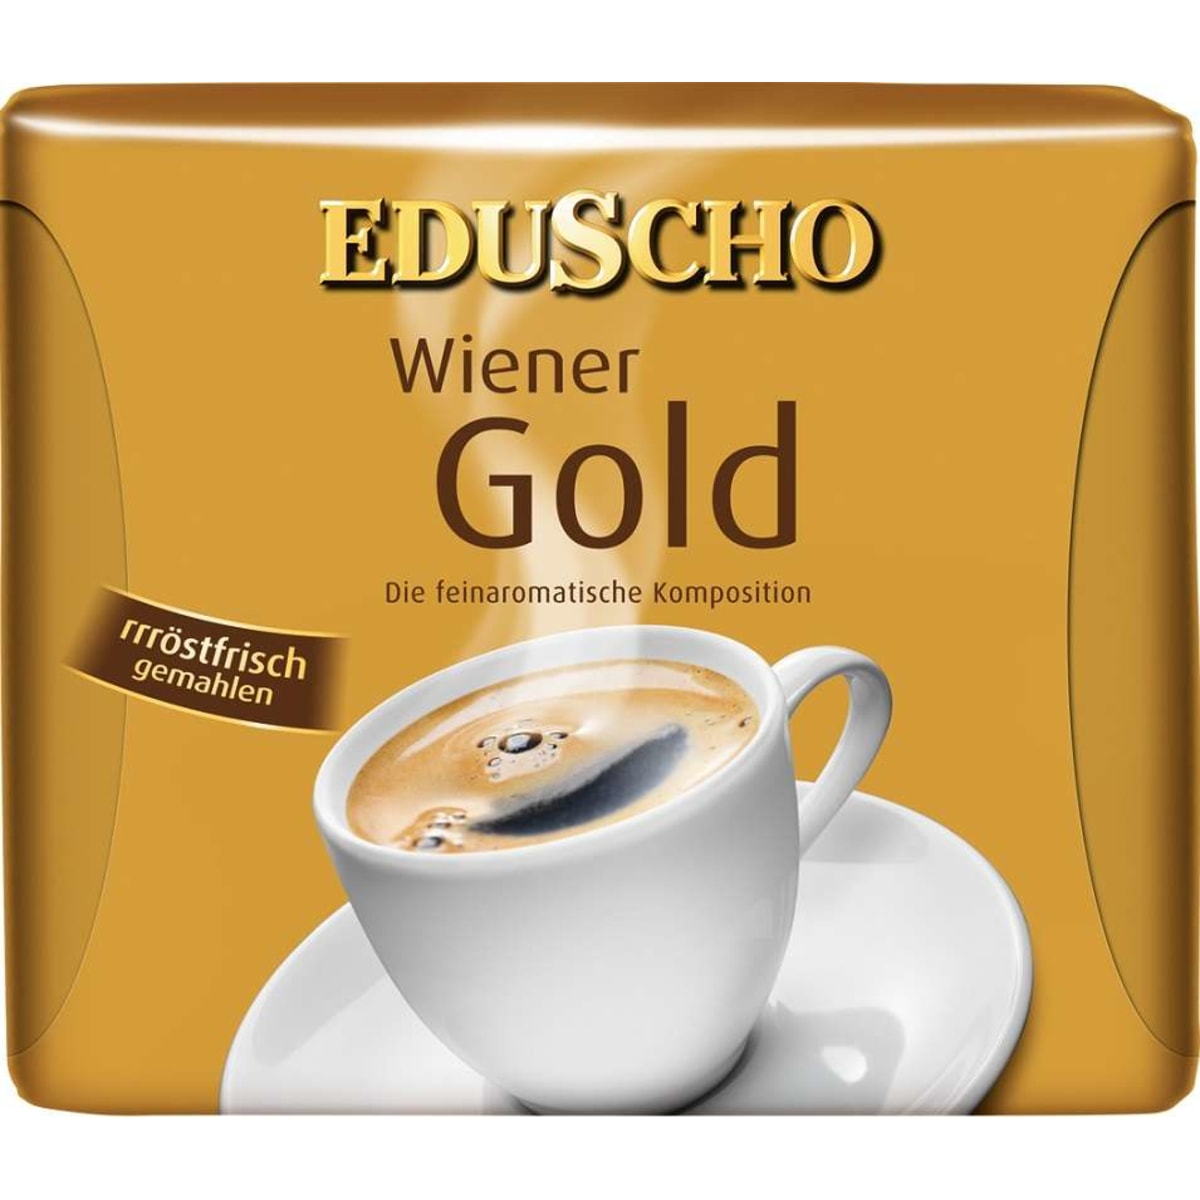 Eduscho Wiener Gold Vac 2x250g